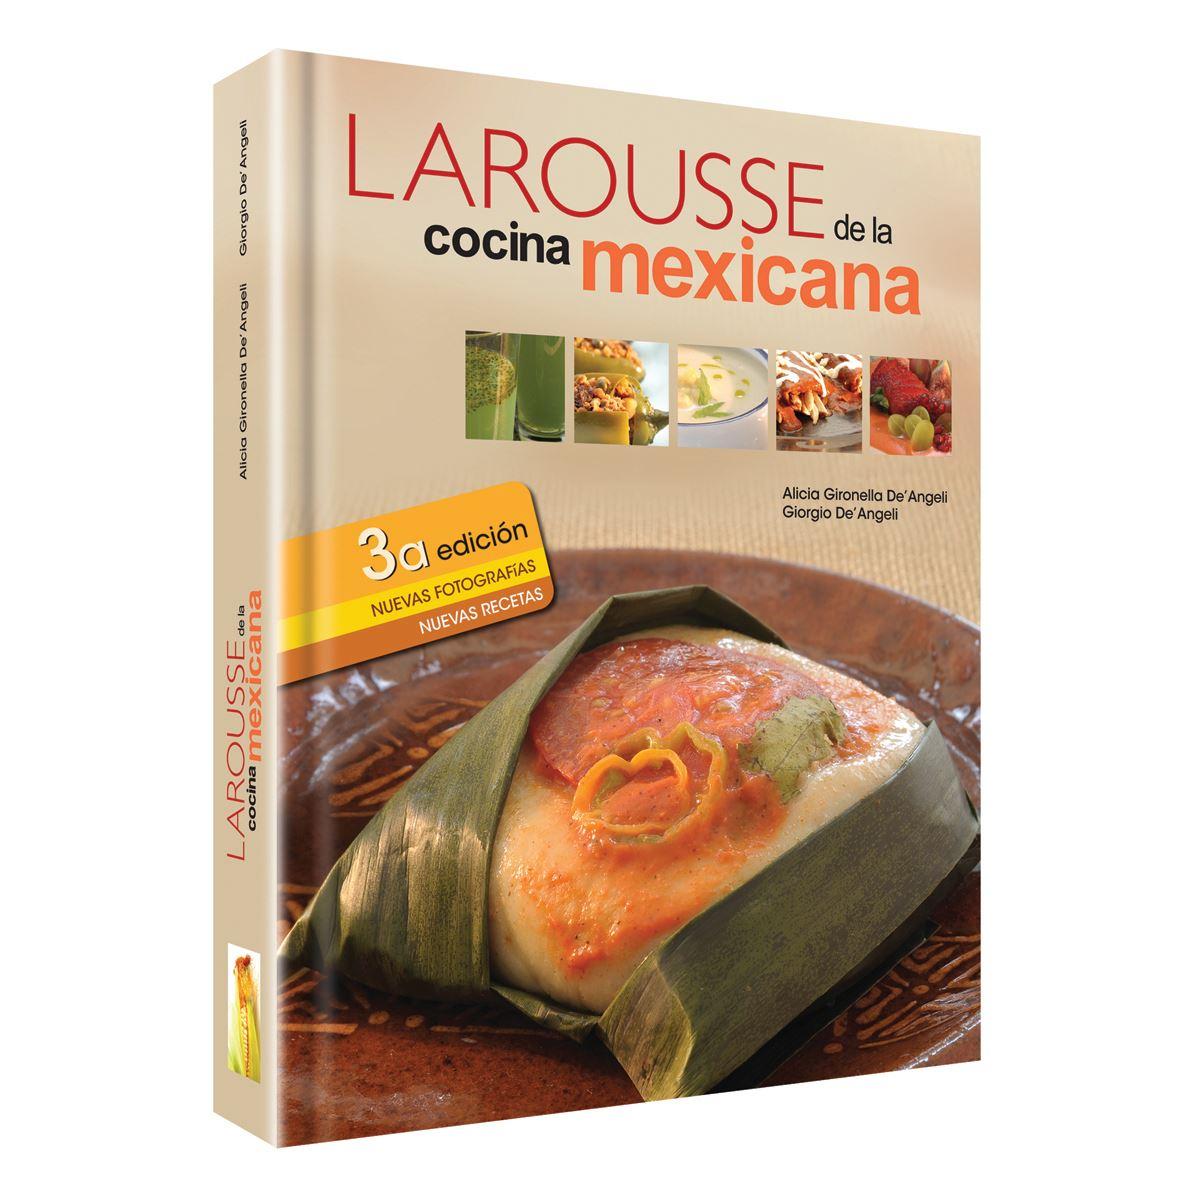 Larousse de la cocina mexicana Libro - Sanborns